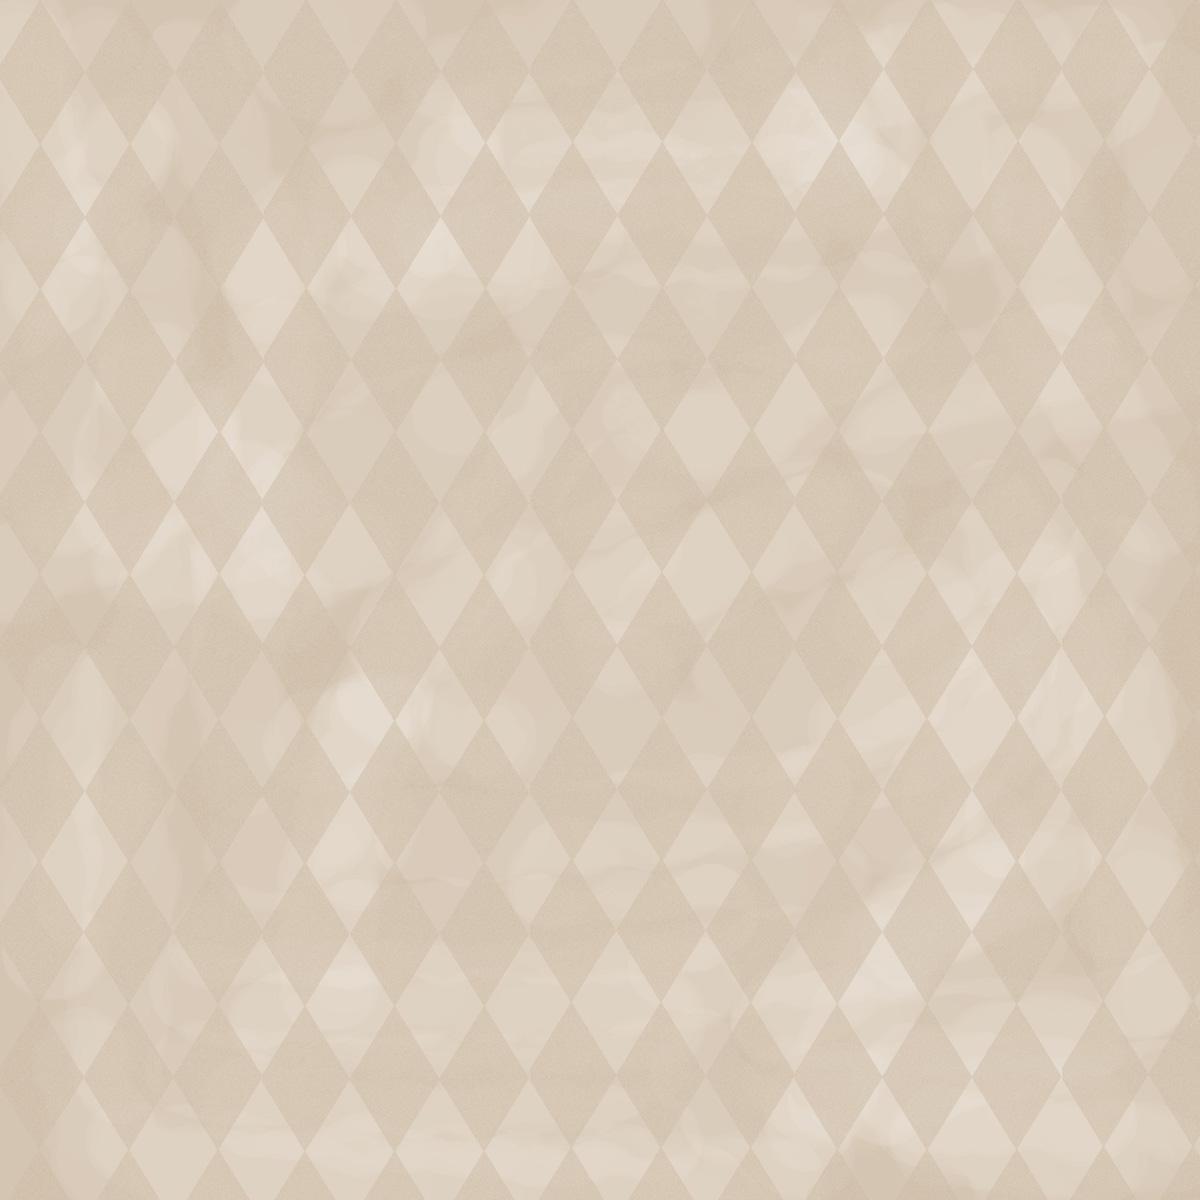 GRANNY ENCHANTED'S BLOG: Free Digital Scrapbook Diamond